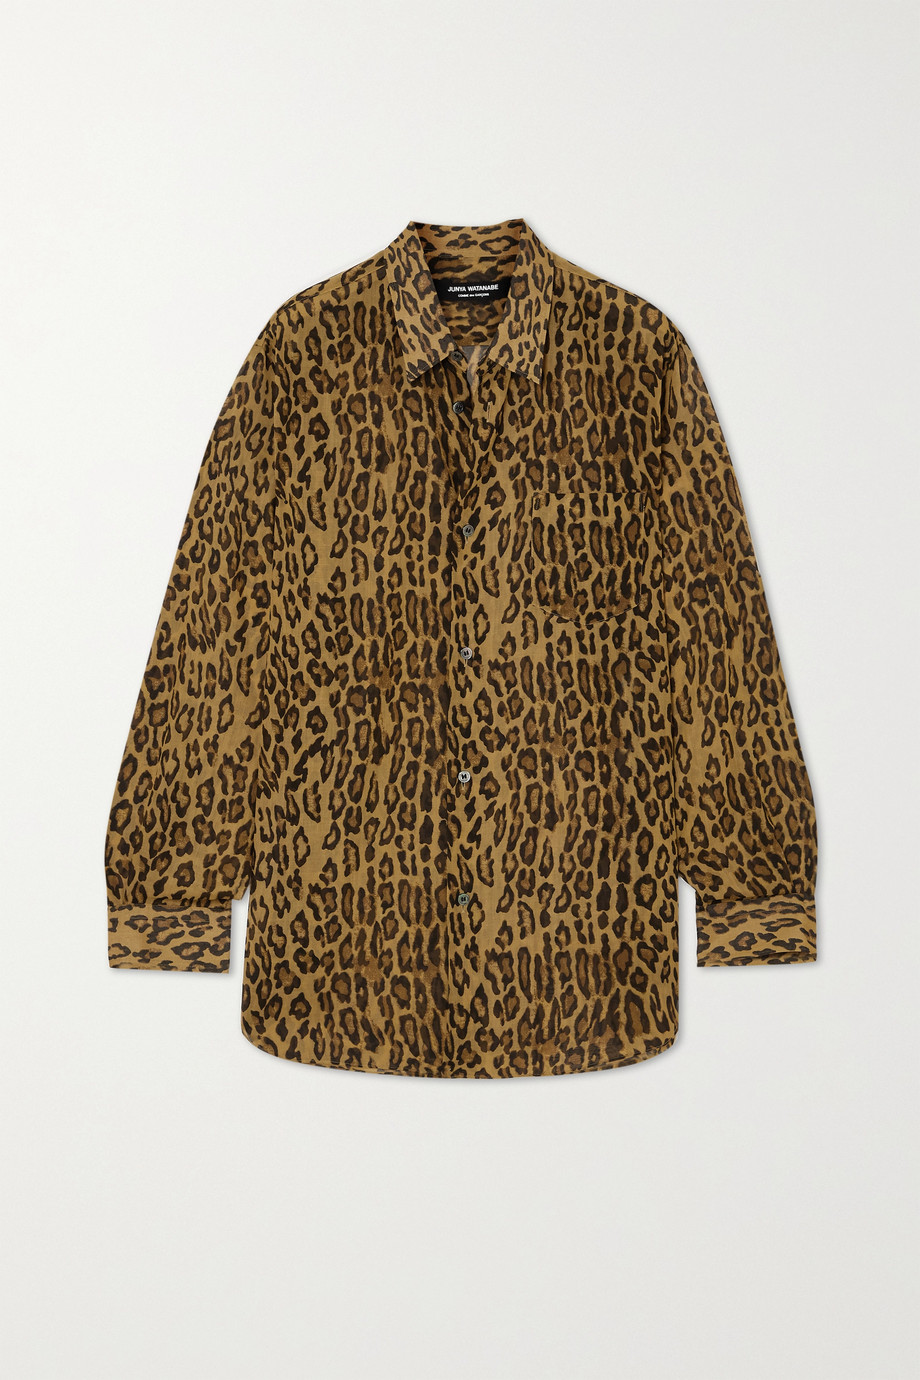 Junya Watanabe Leopard-print voile shirt